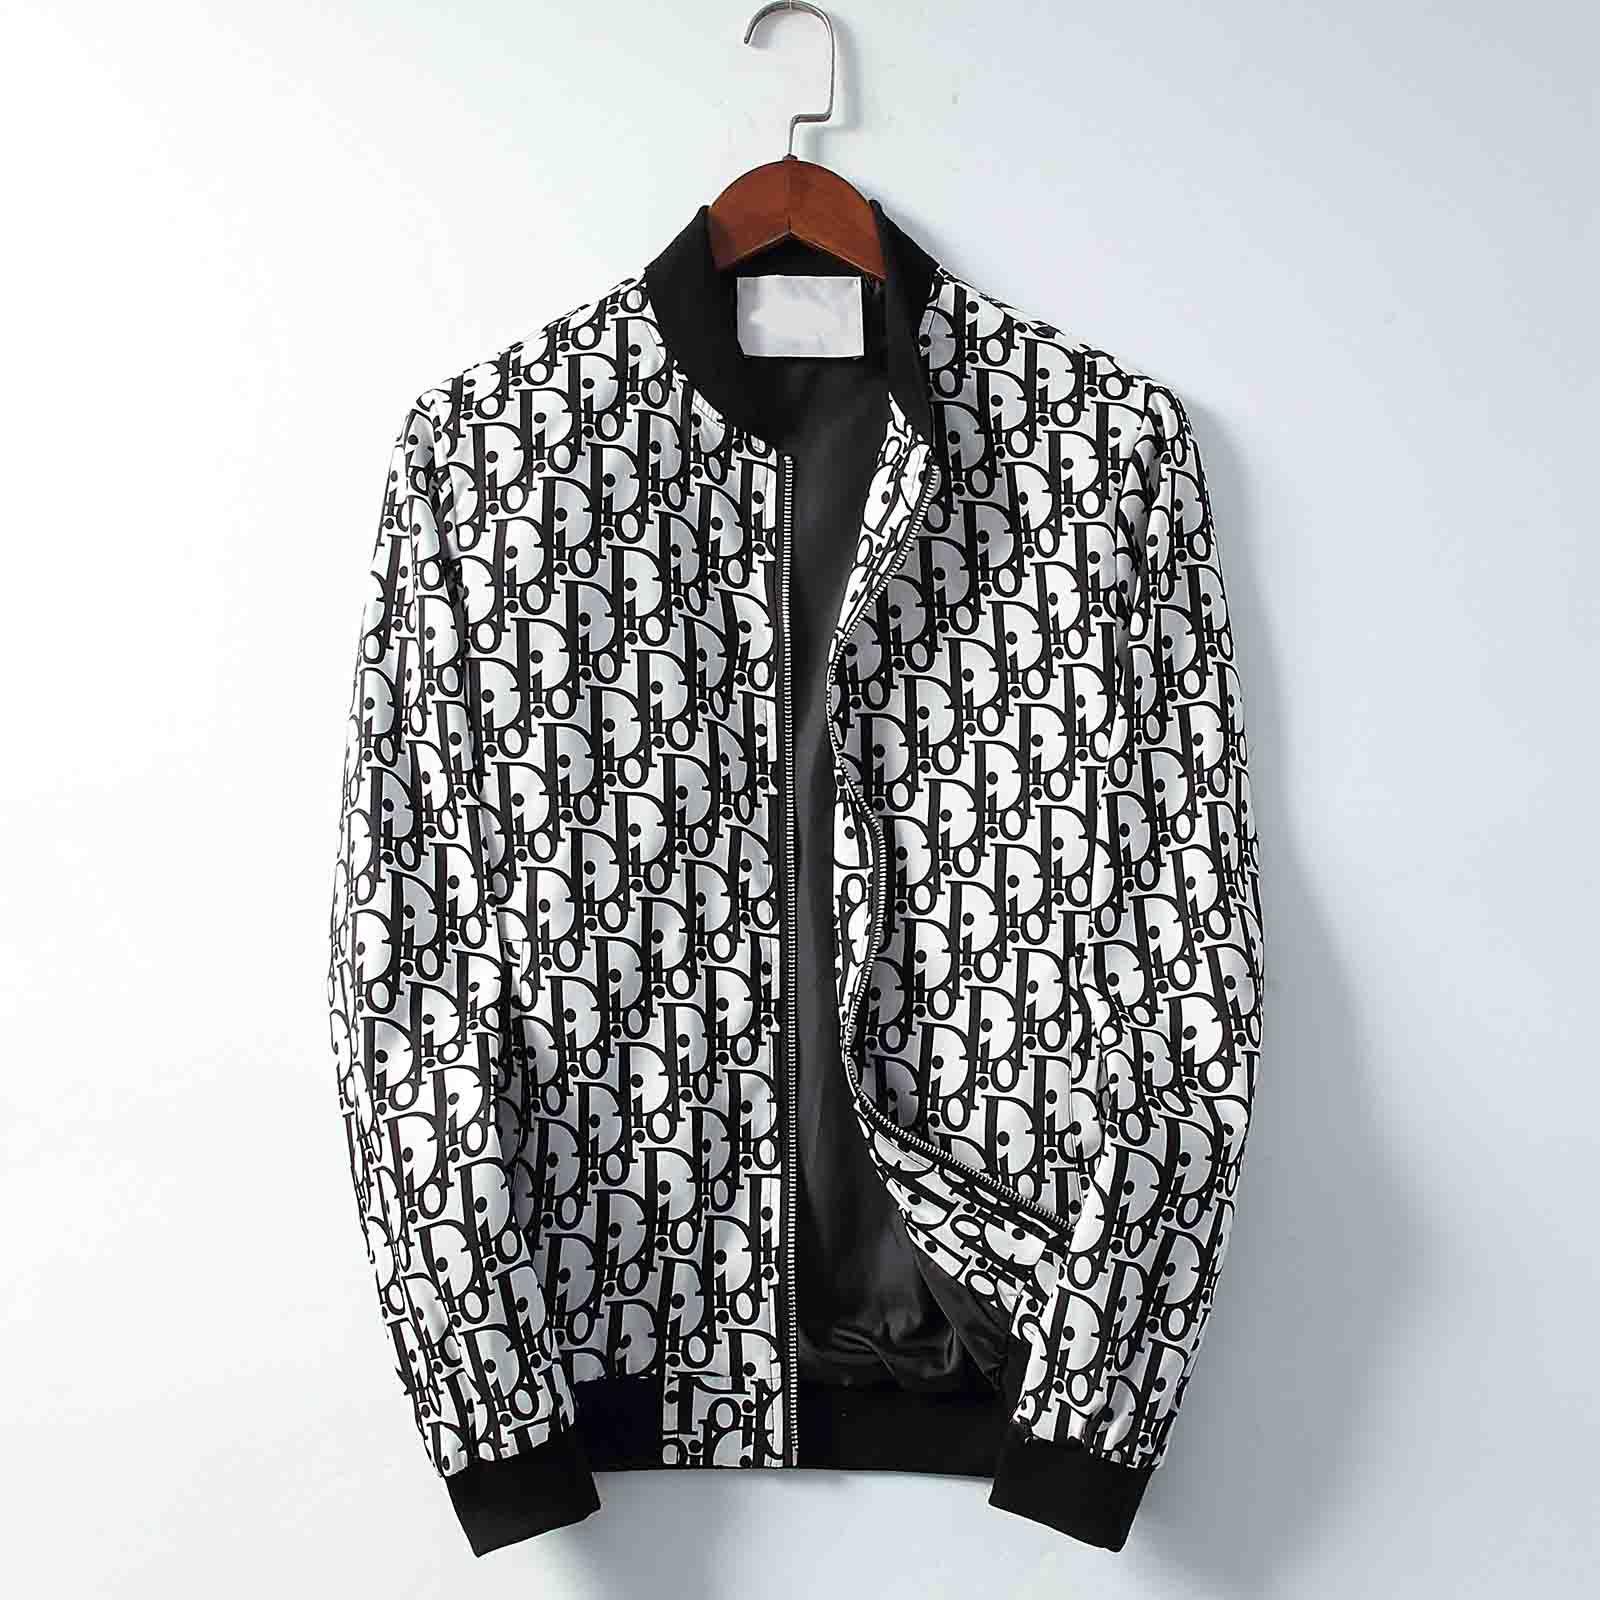 Coats Jacket Marca New Outono Inverno Mens Clothes Zipper Casacos Moda Casual mangas compridas com capuz Windbreaker Jaquetas Homens Mulheres Esporte